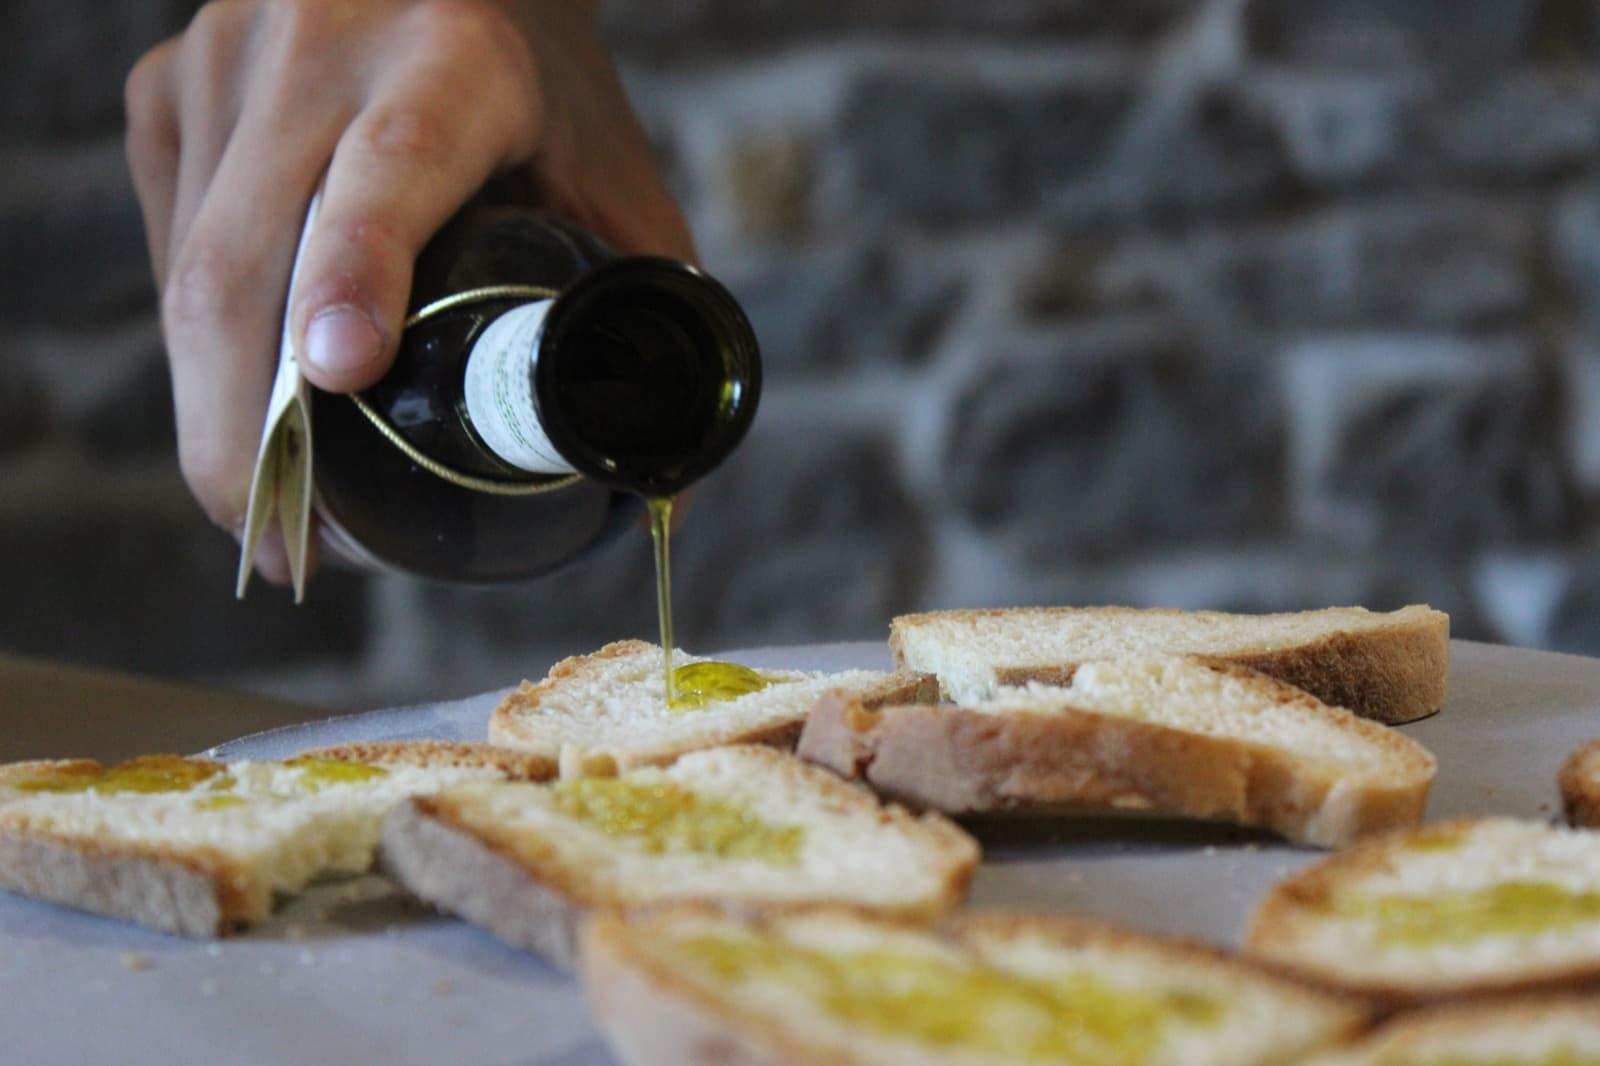 Discovering the origins: tastes and traditions of Emilia Romagna Region